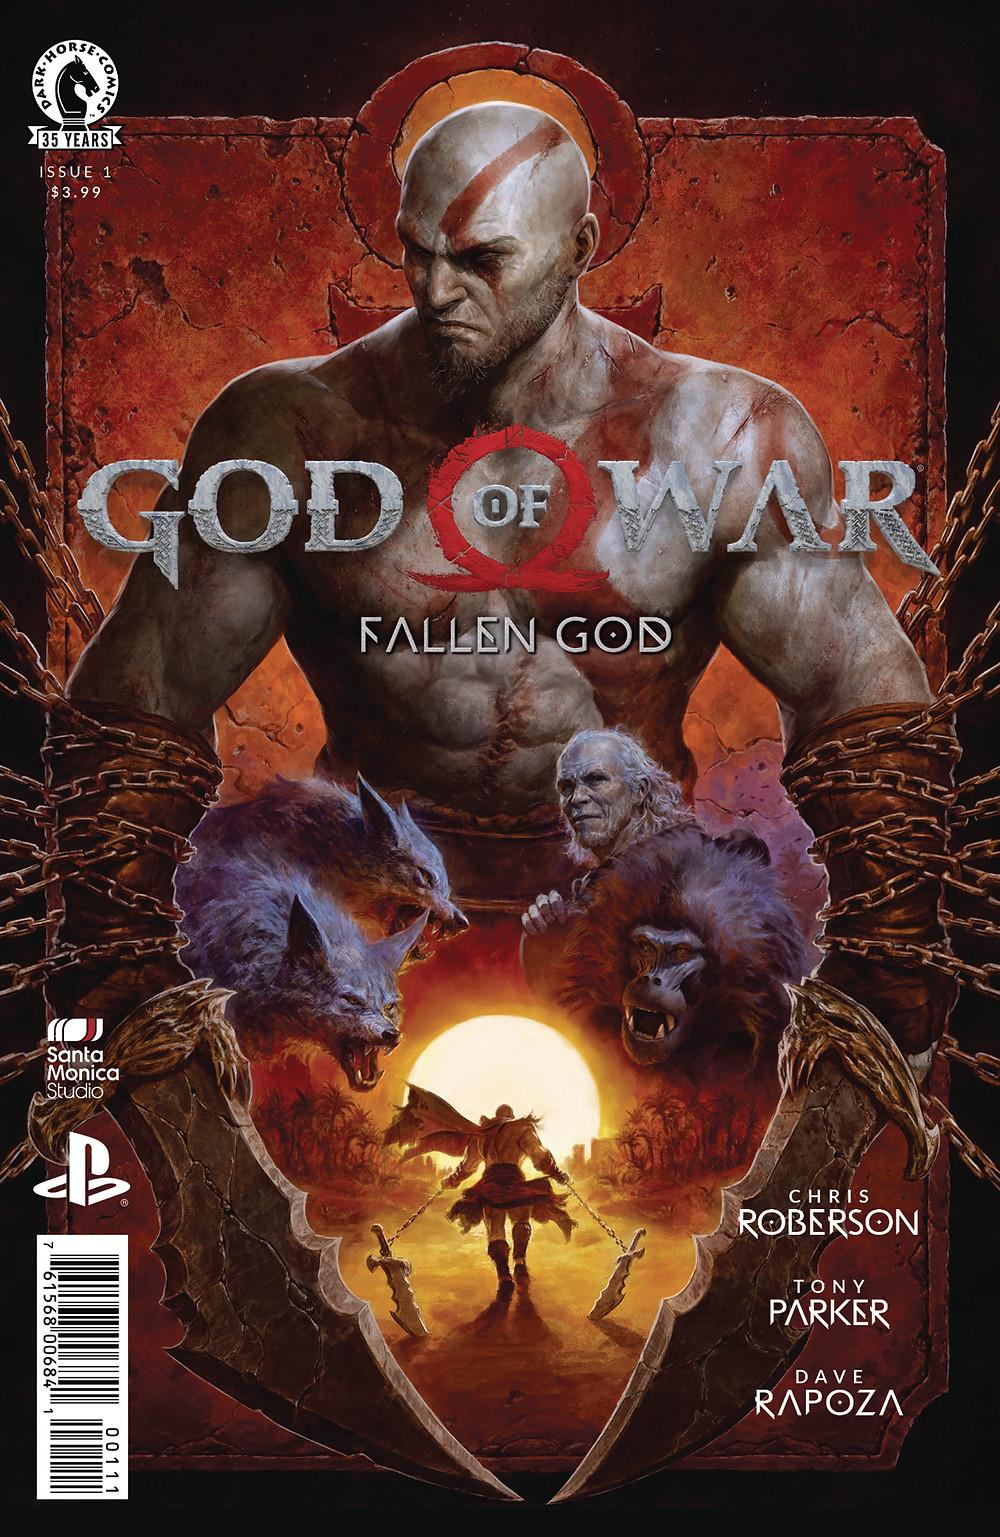 God of War: Fallen God #1 Cover